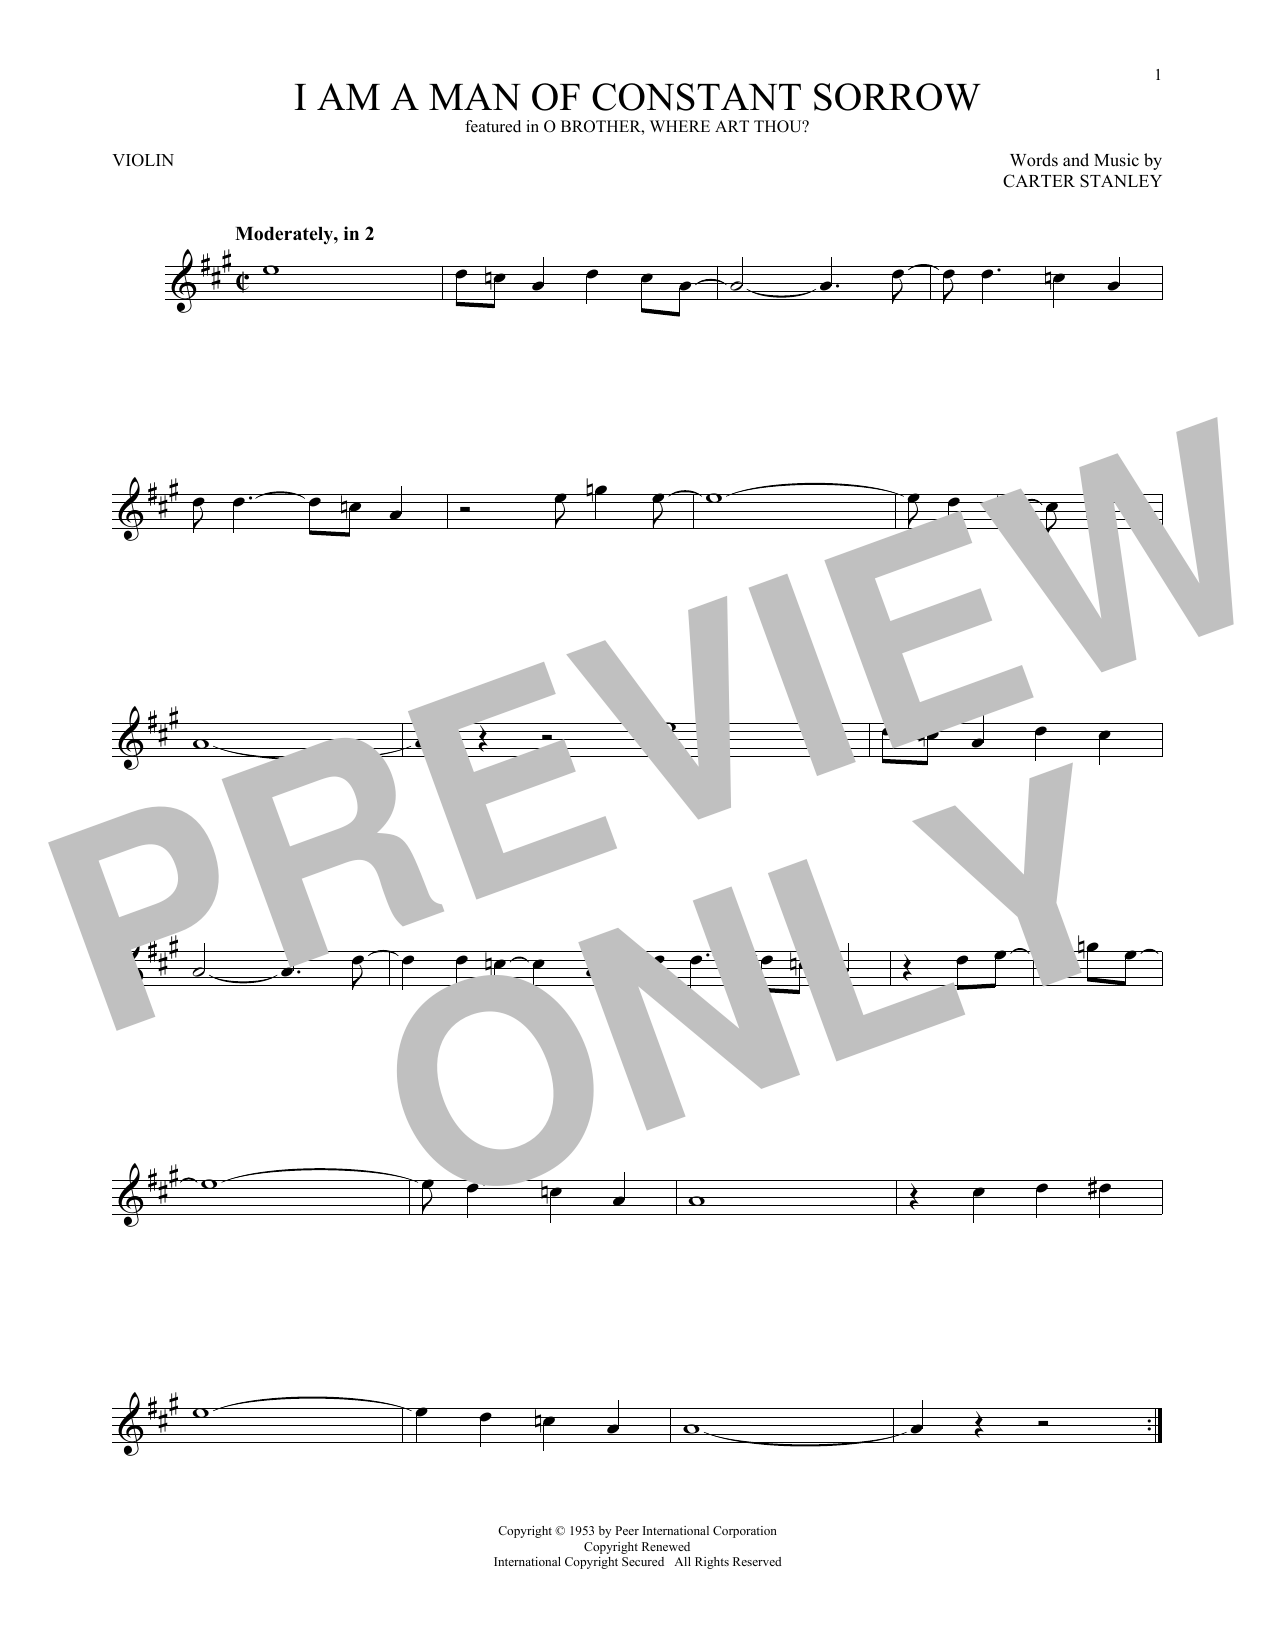 Sheet Music Digital Files To Print Licensed Carter Stanley Digital